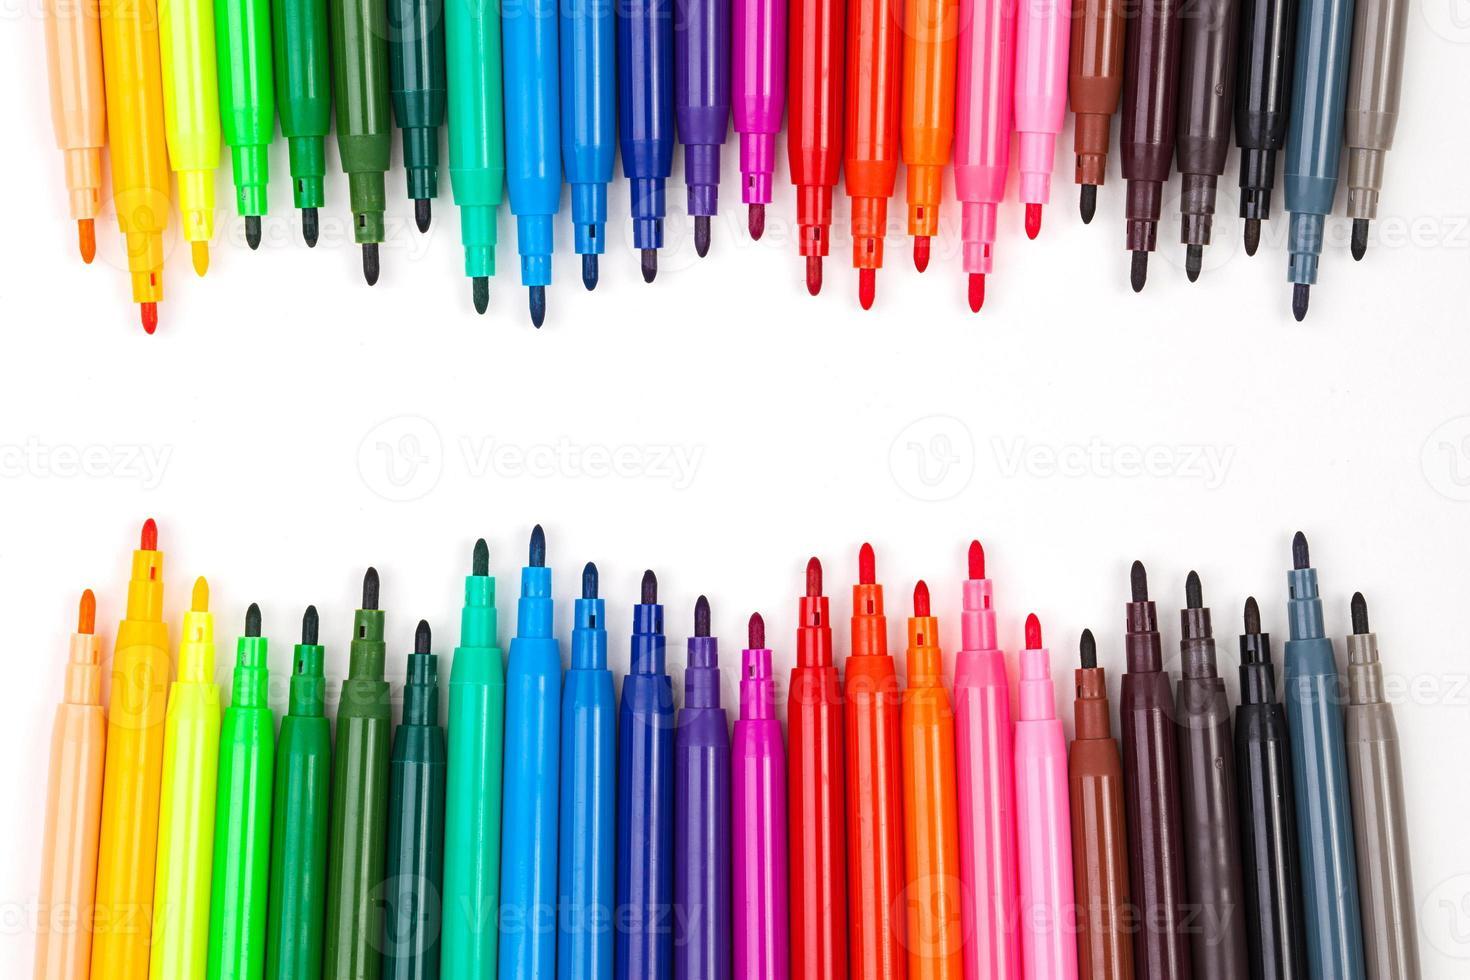 penna a colori foto